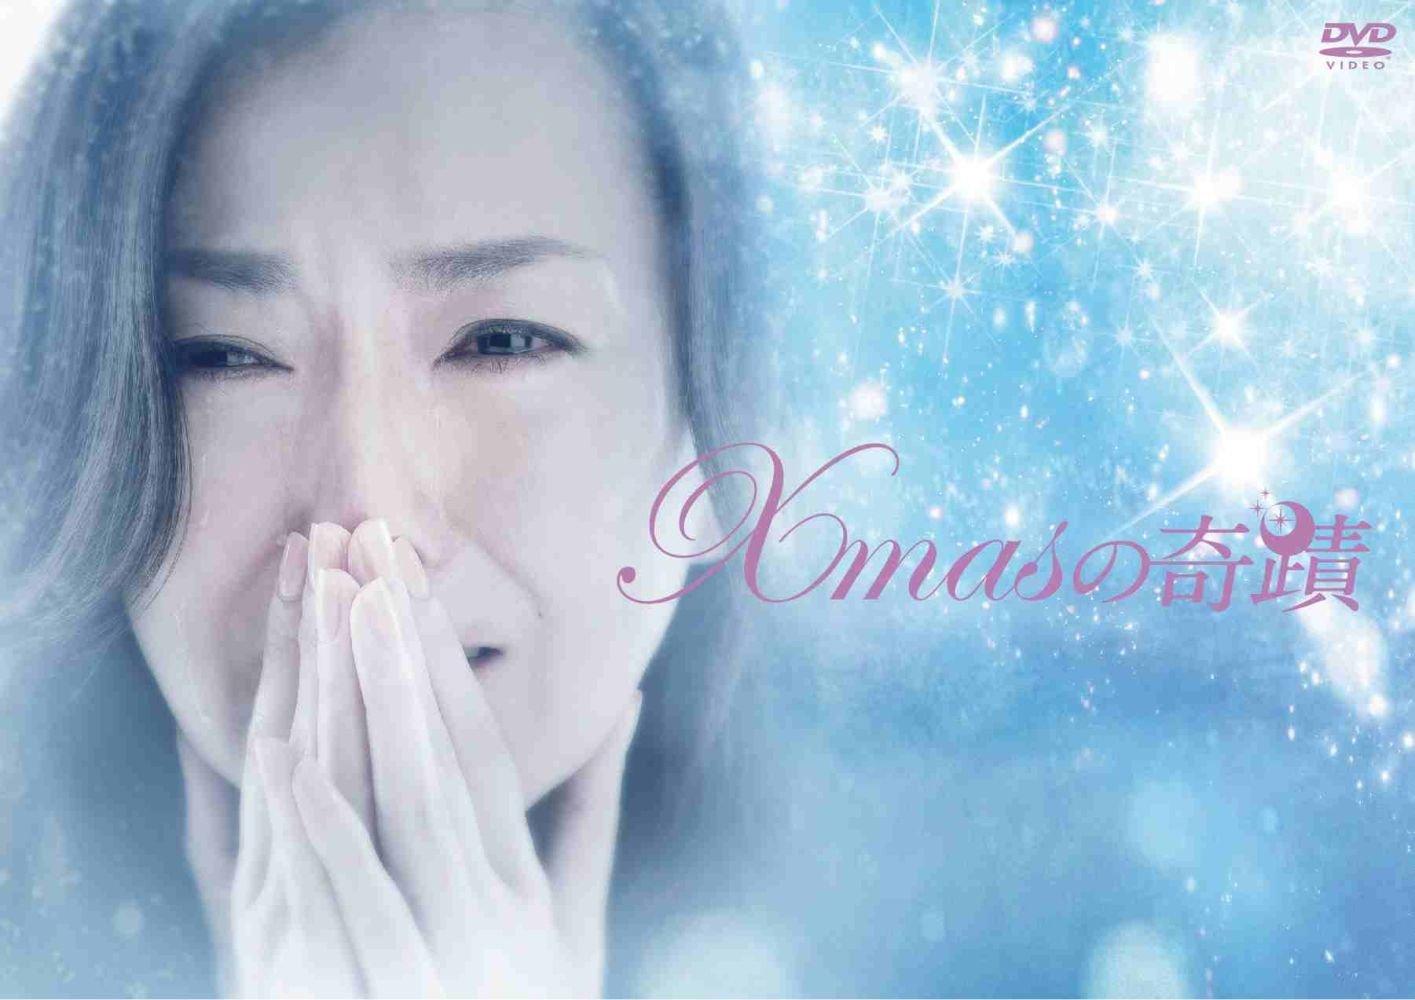 Xmasの奇蹟 DVD-BOX B005X4N8ZM